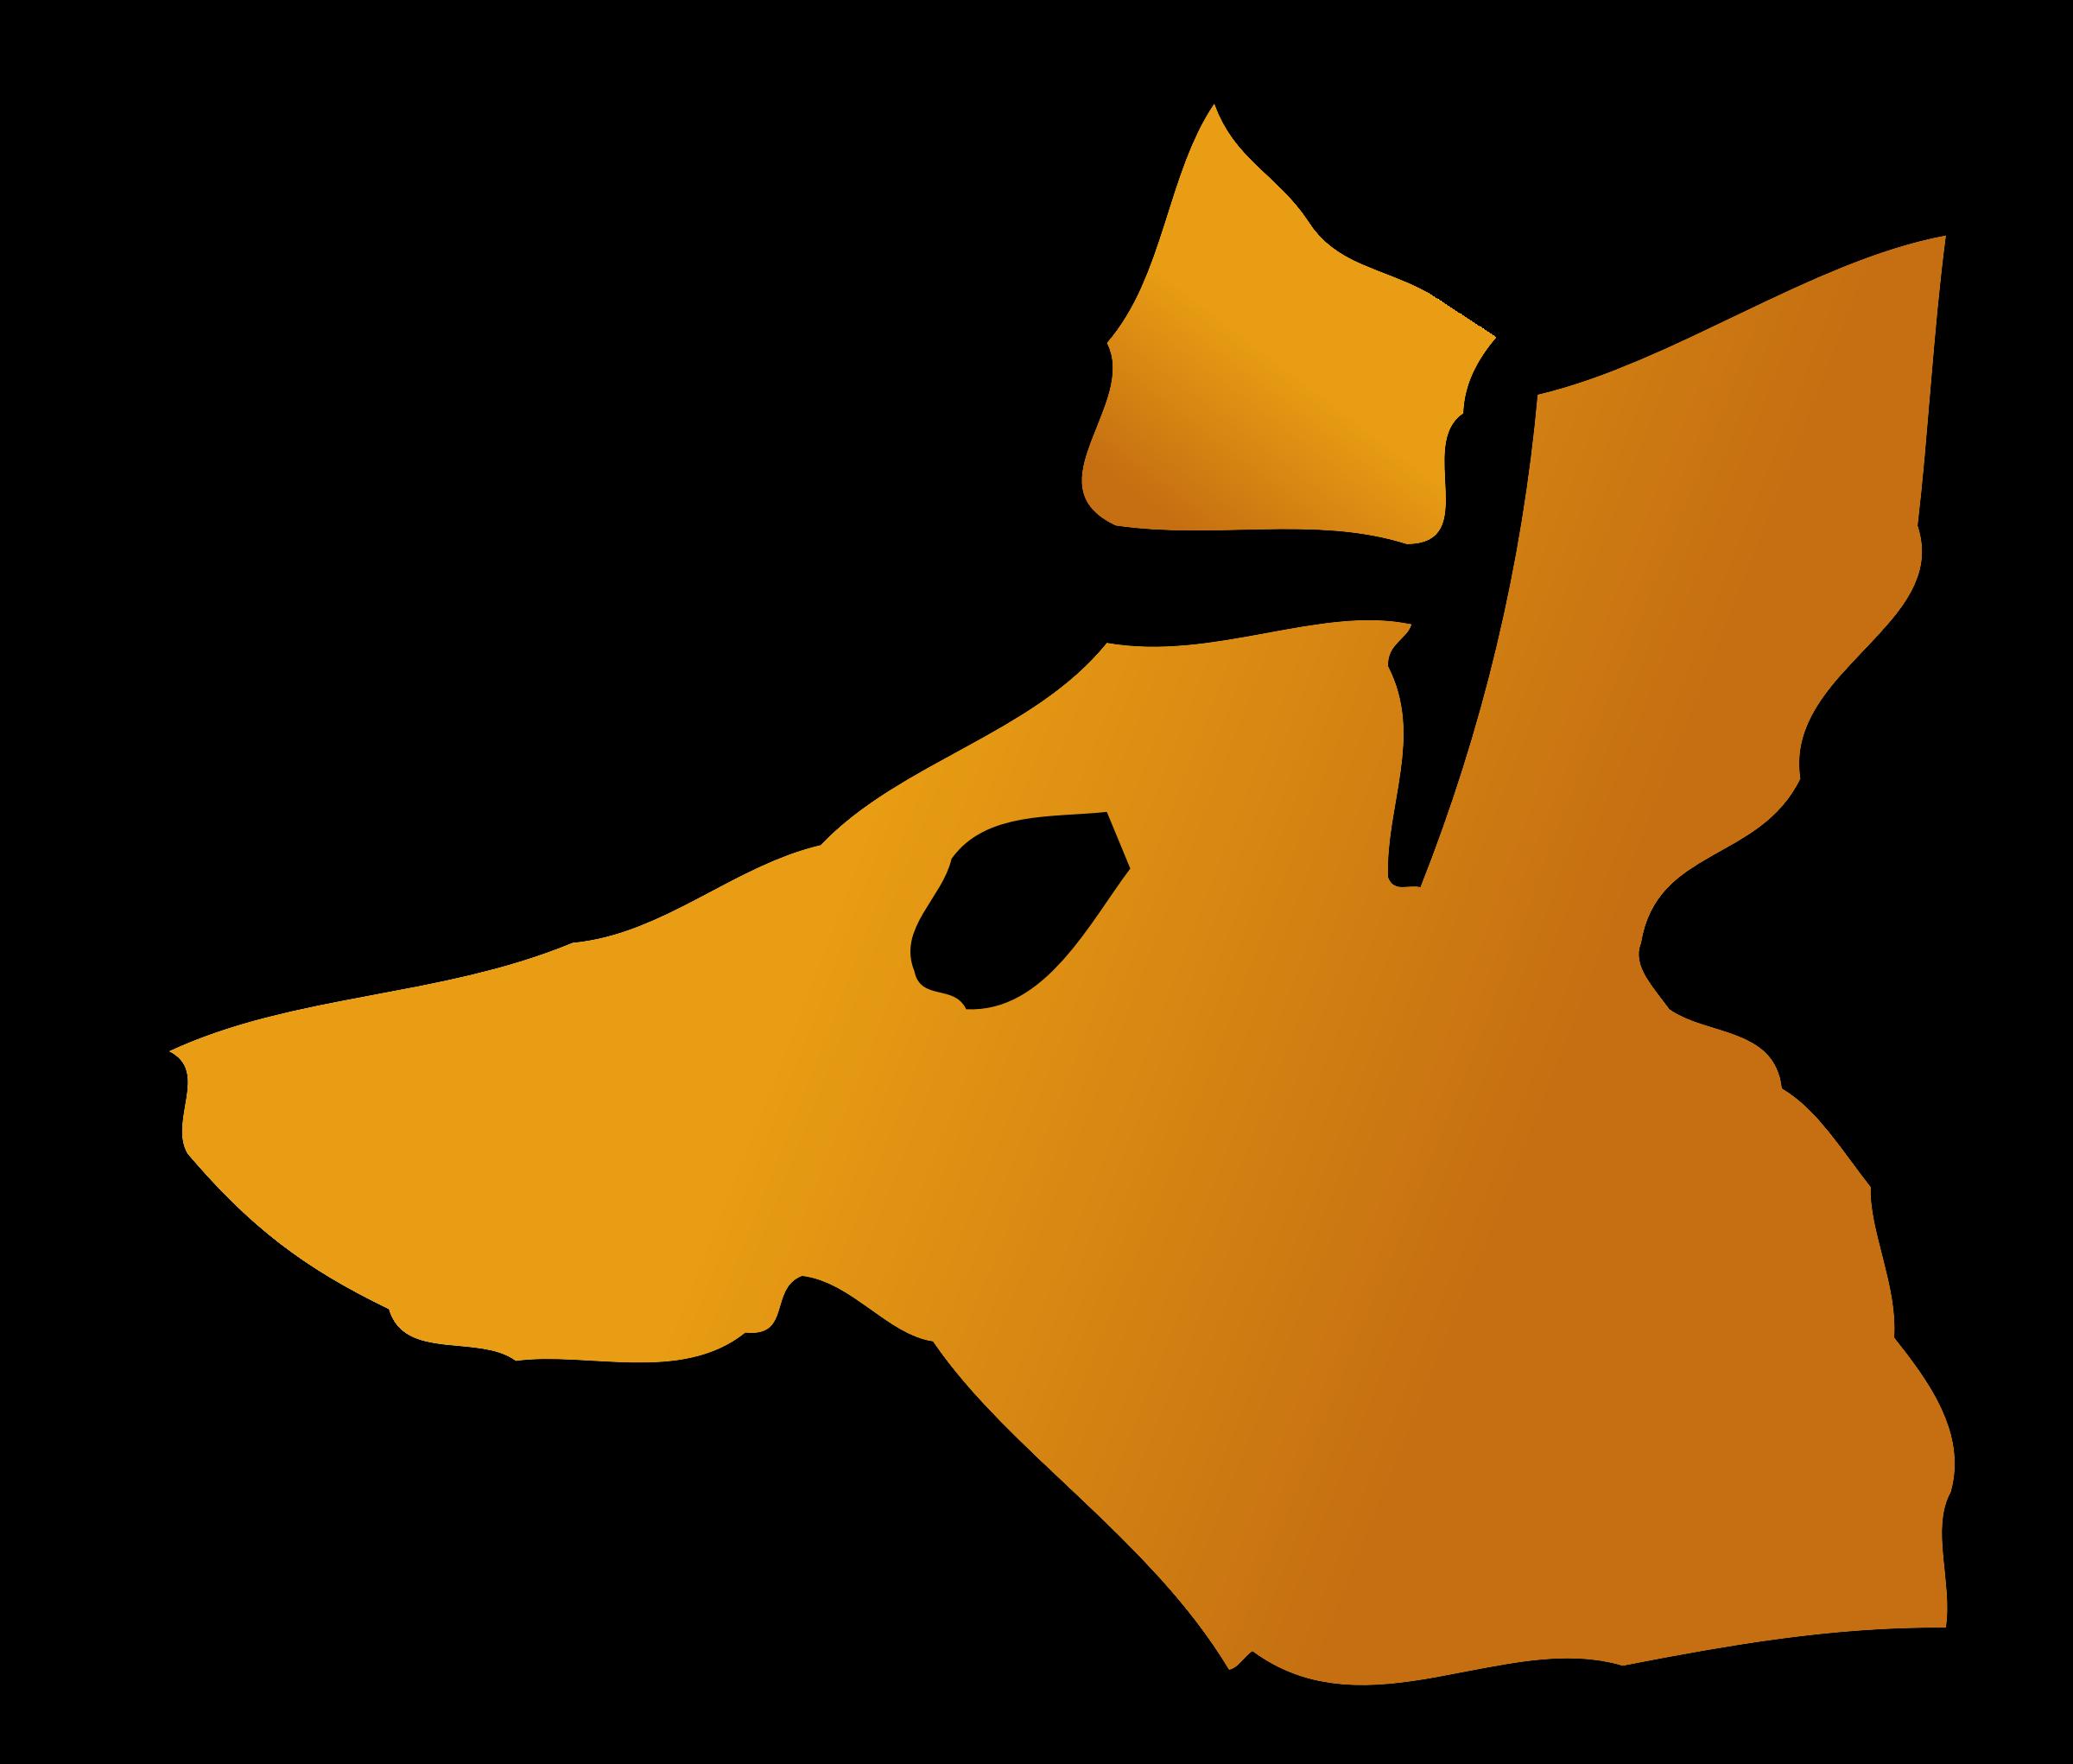 Fox clipart standing. Head at getdrawings com